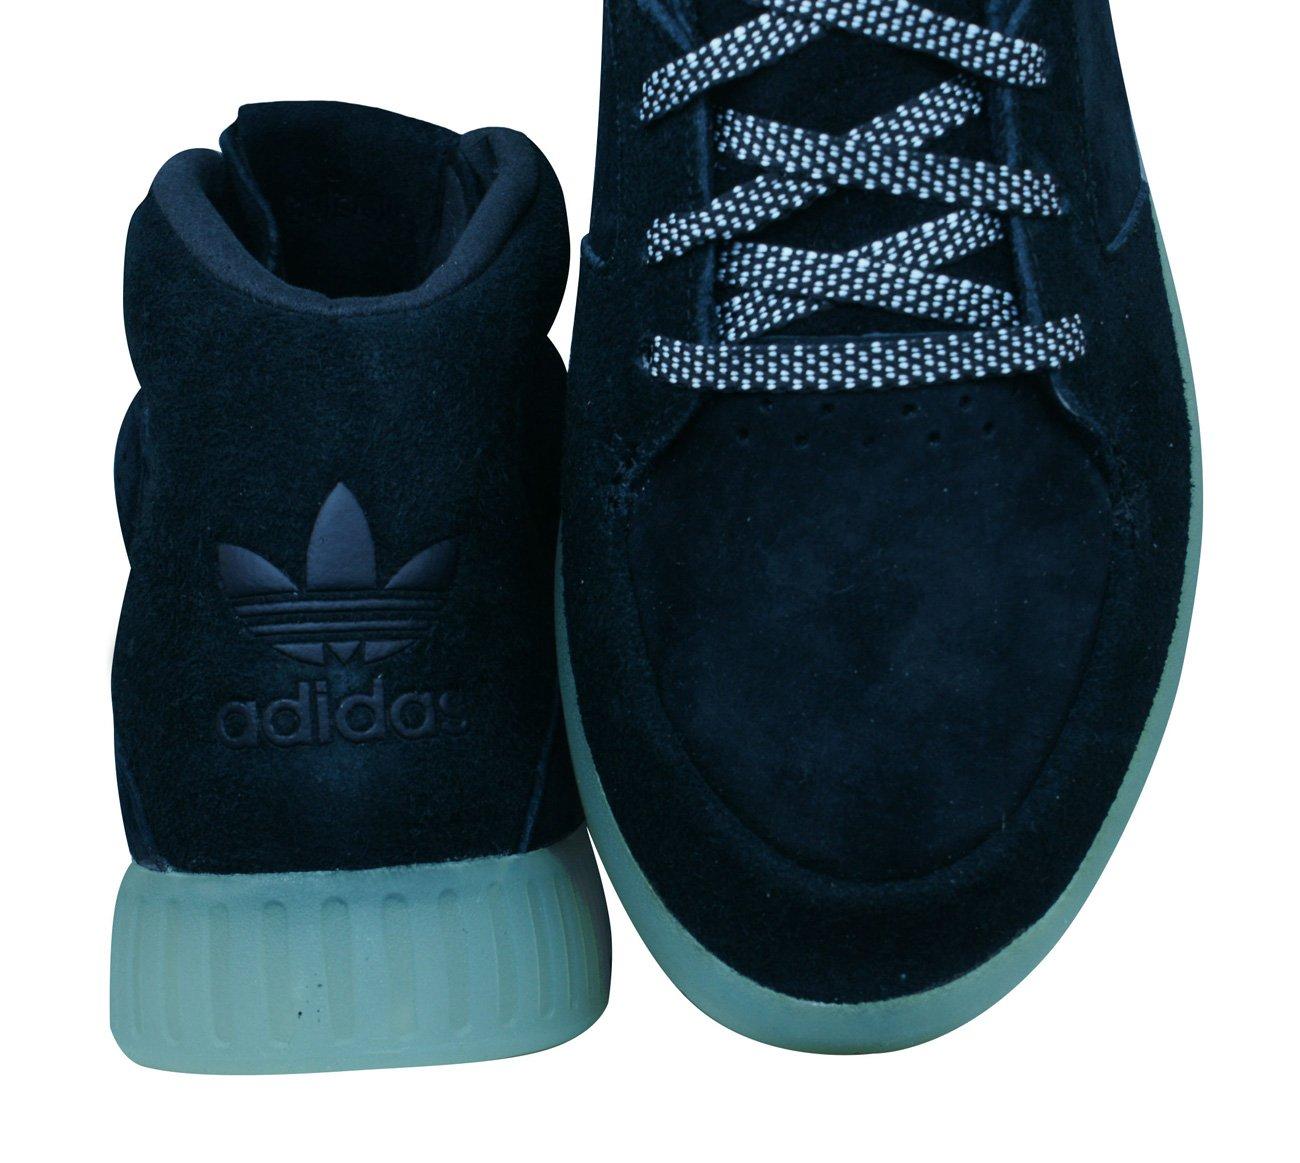 8d1a199ea78723 adidas Men s Tubular Invader 2.0 S80403 Boots  Amazon.co.uk  Shoes   Bags